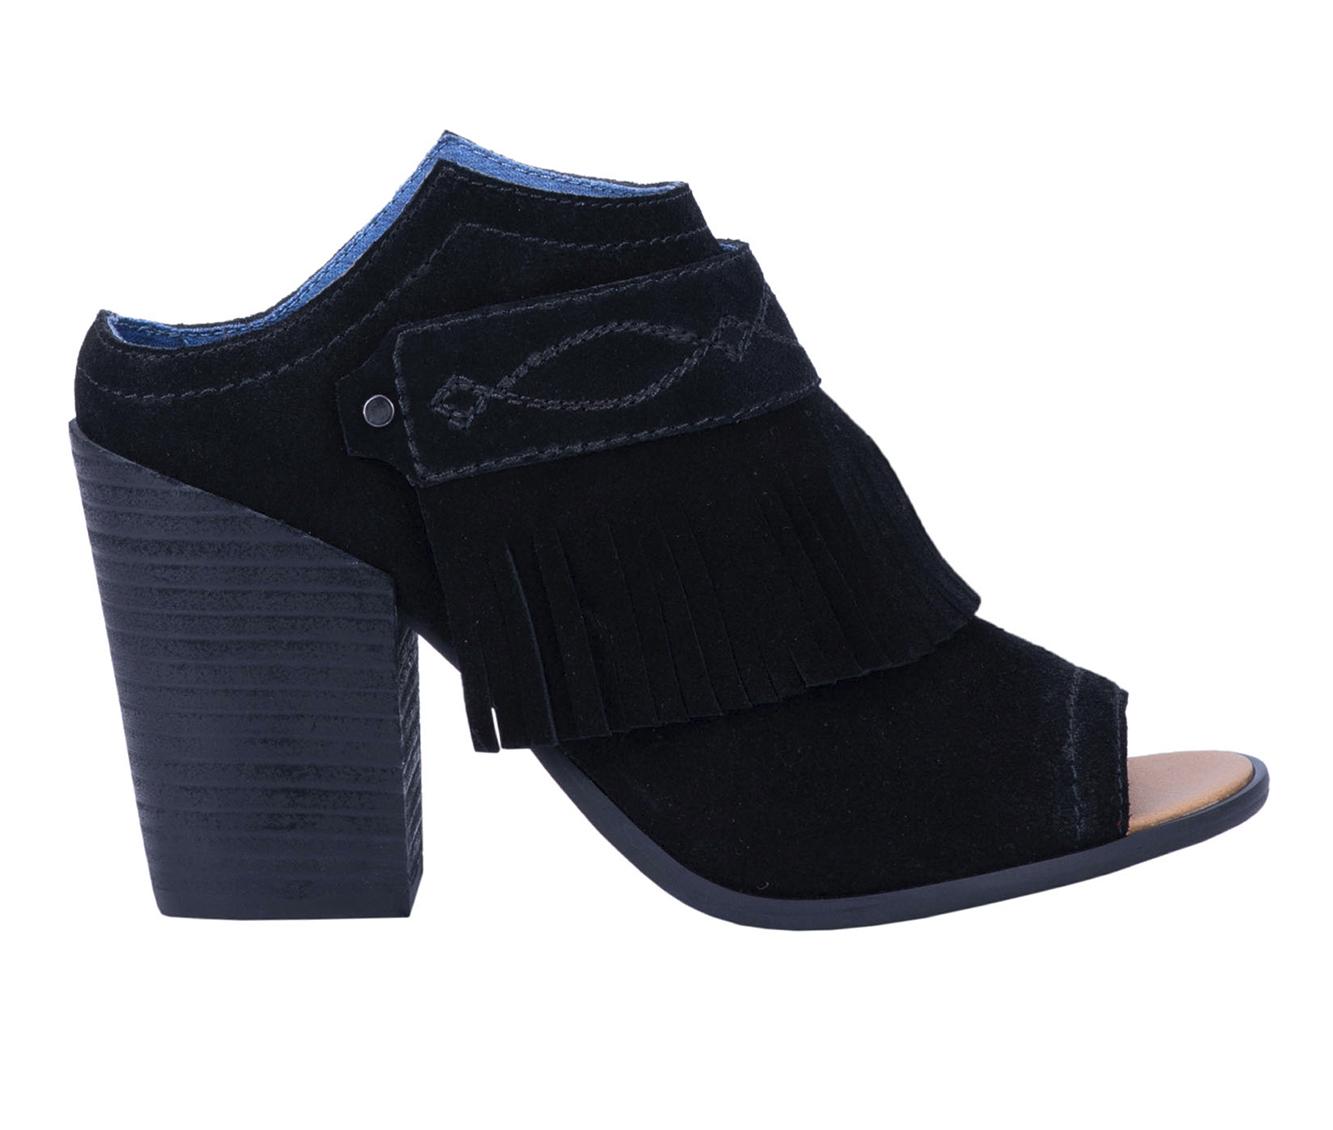 Dingo Boots Shaker Women's Dress Shoe (Black - Leather)